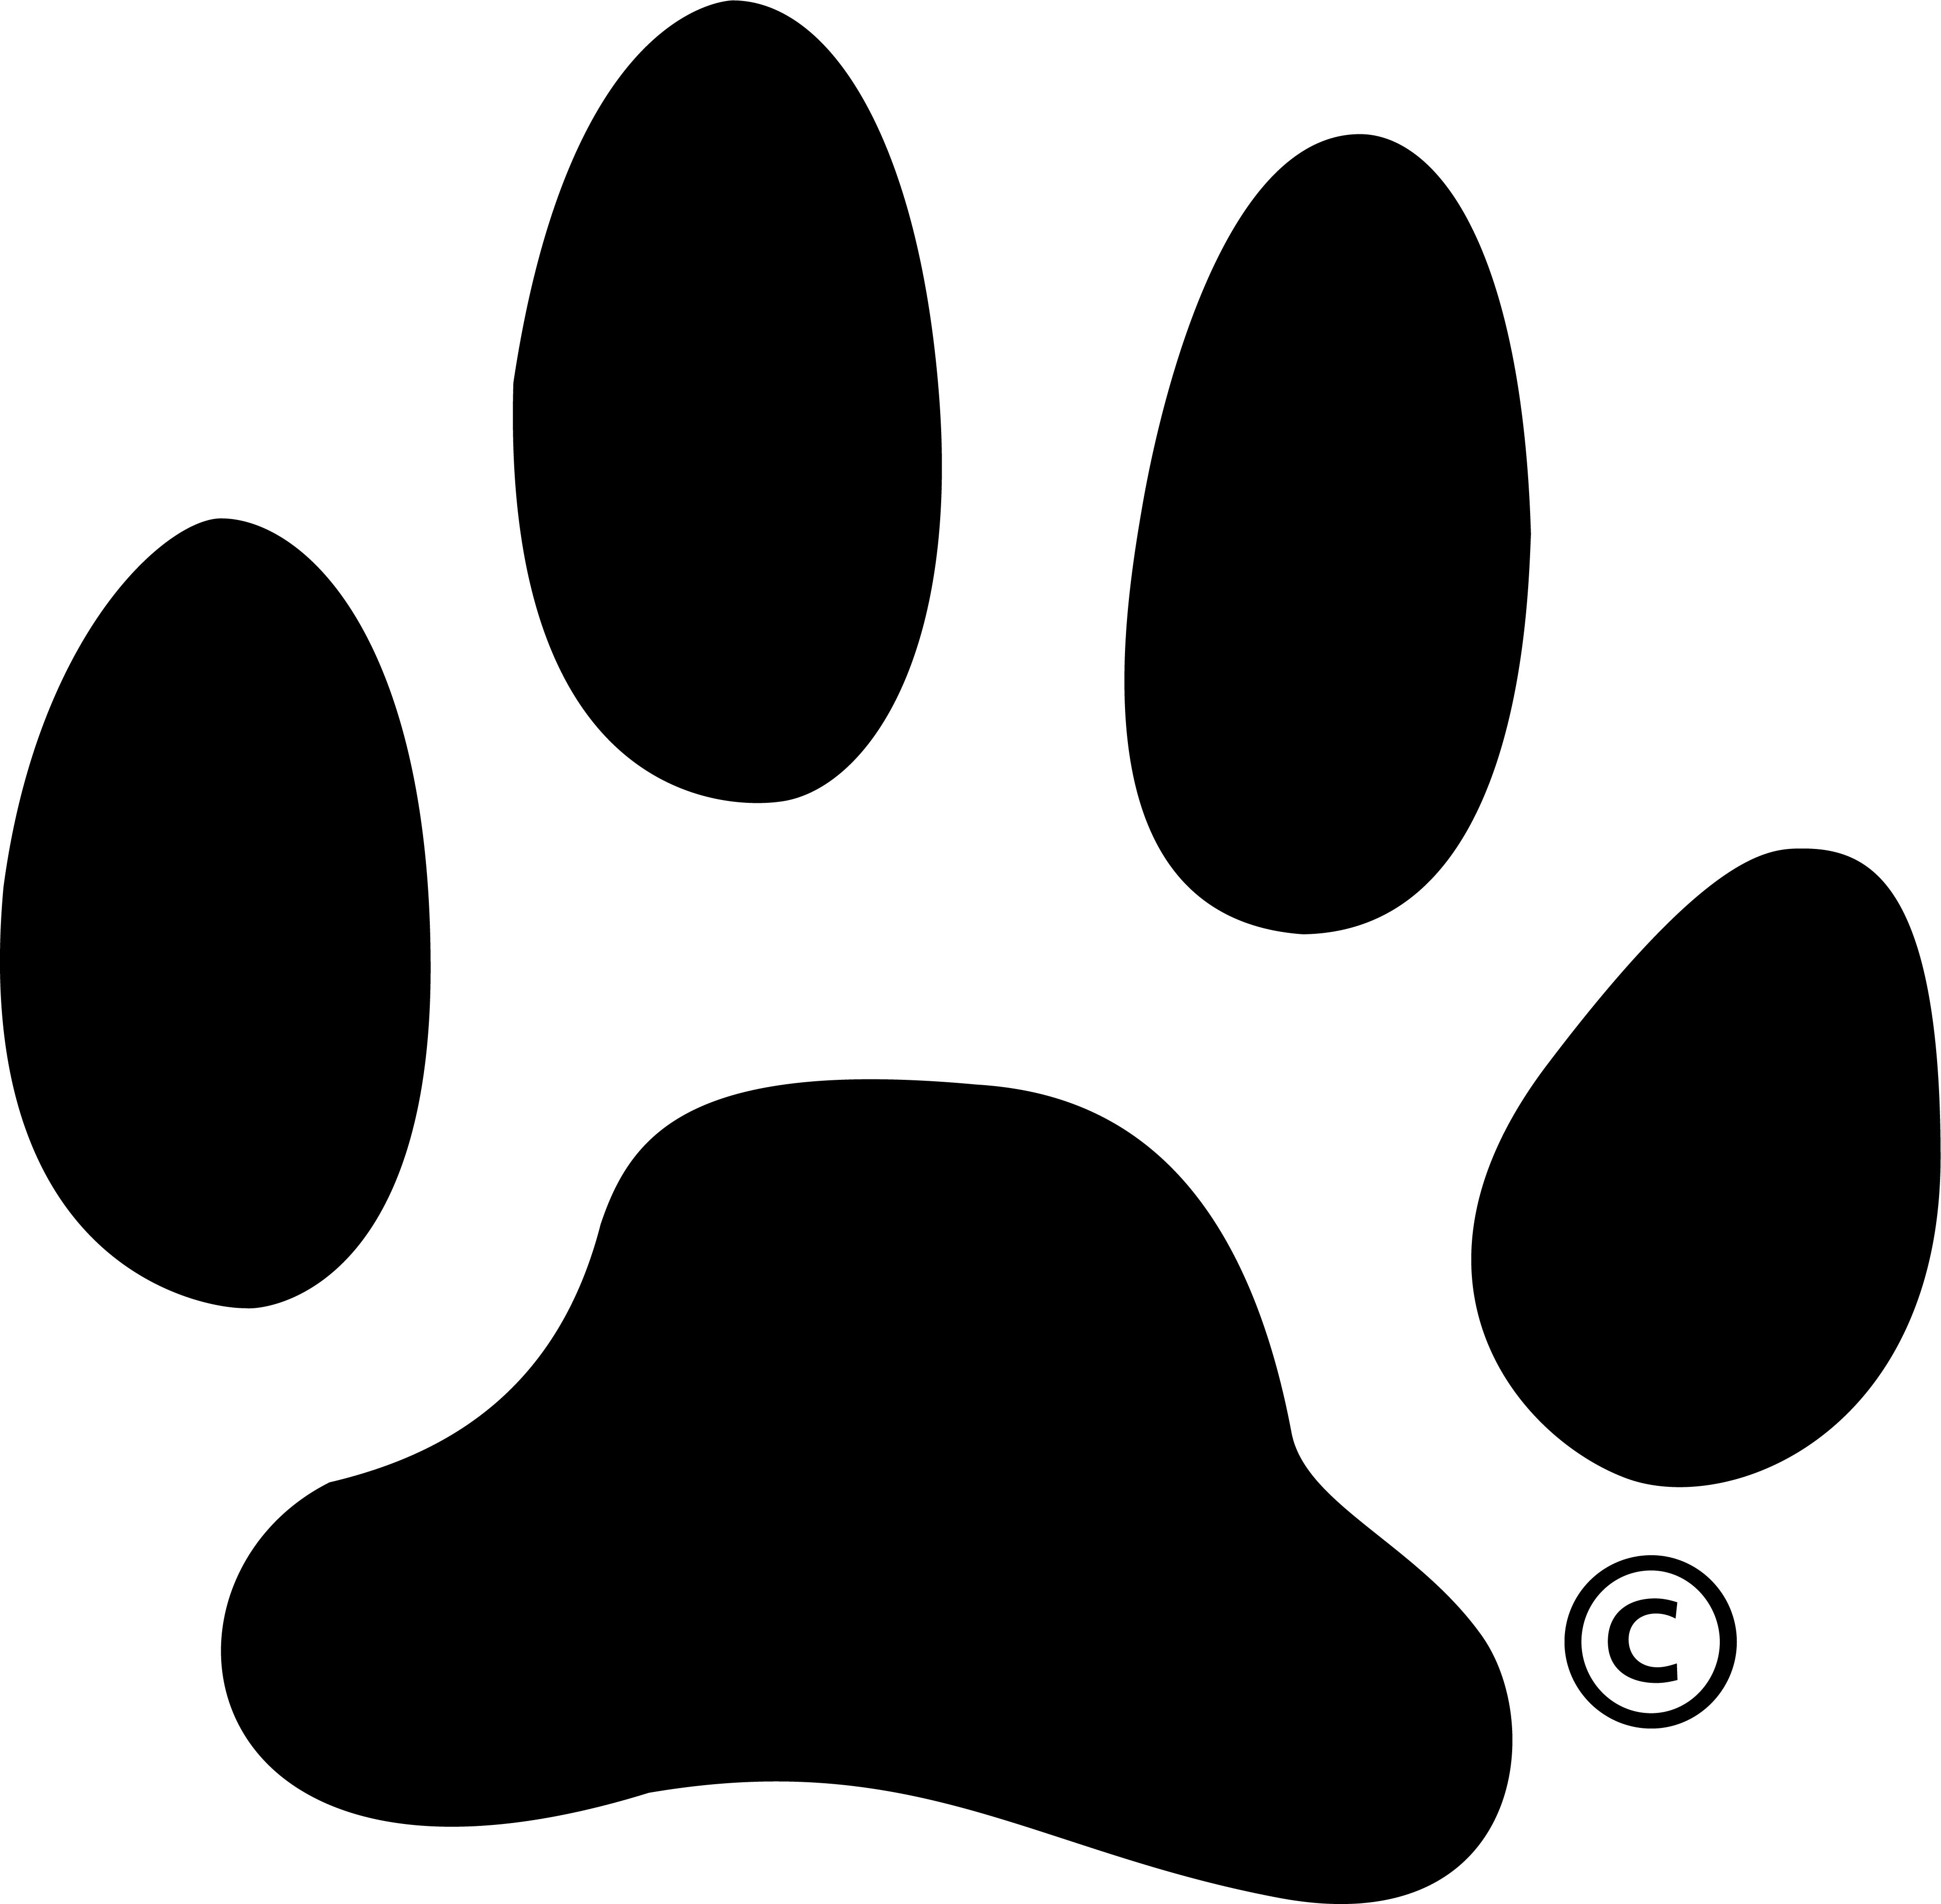 our logos barton community college rh bartonccc edu paw print logos and names paw print logo blue